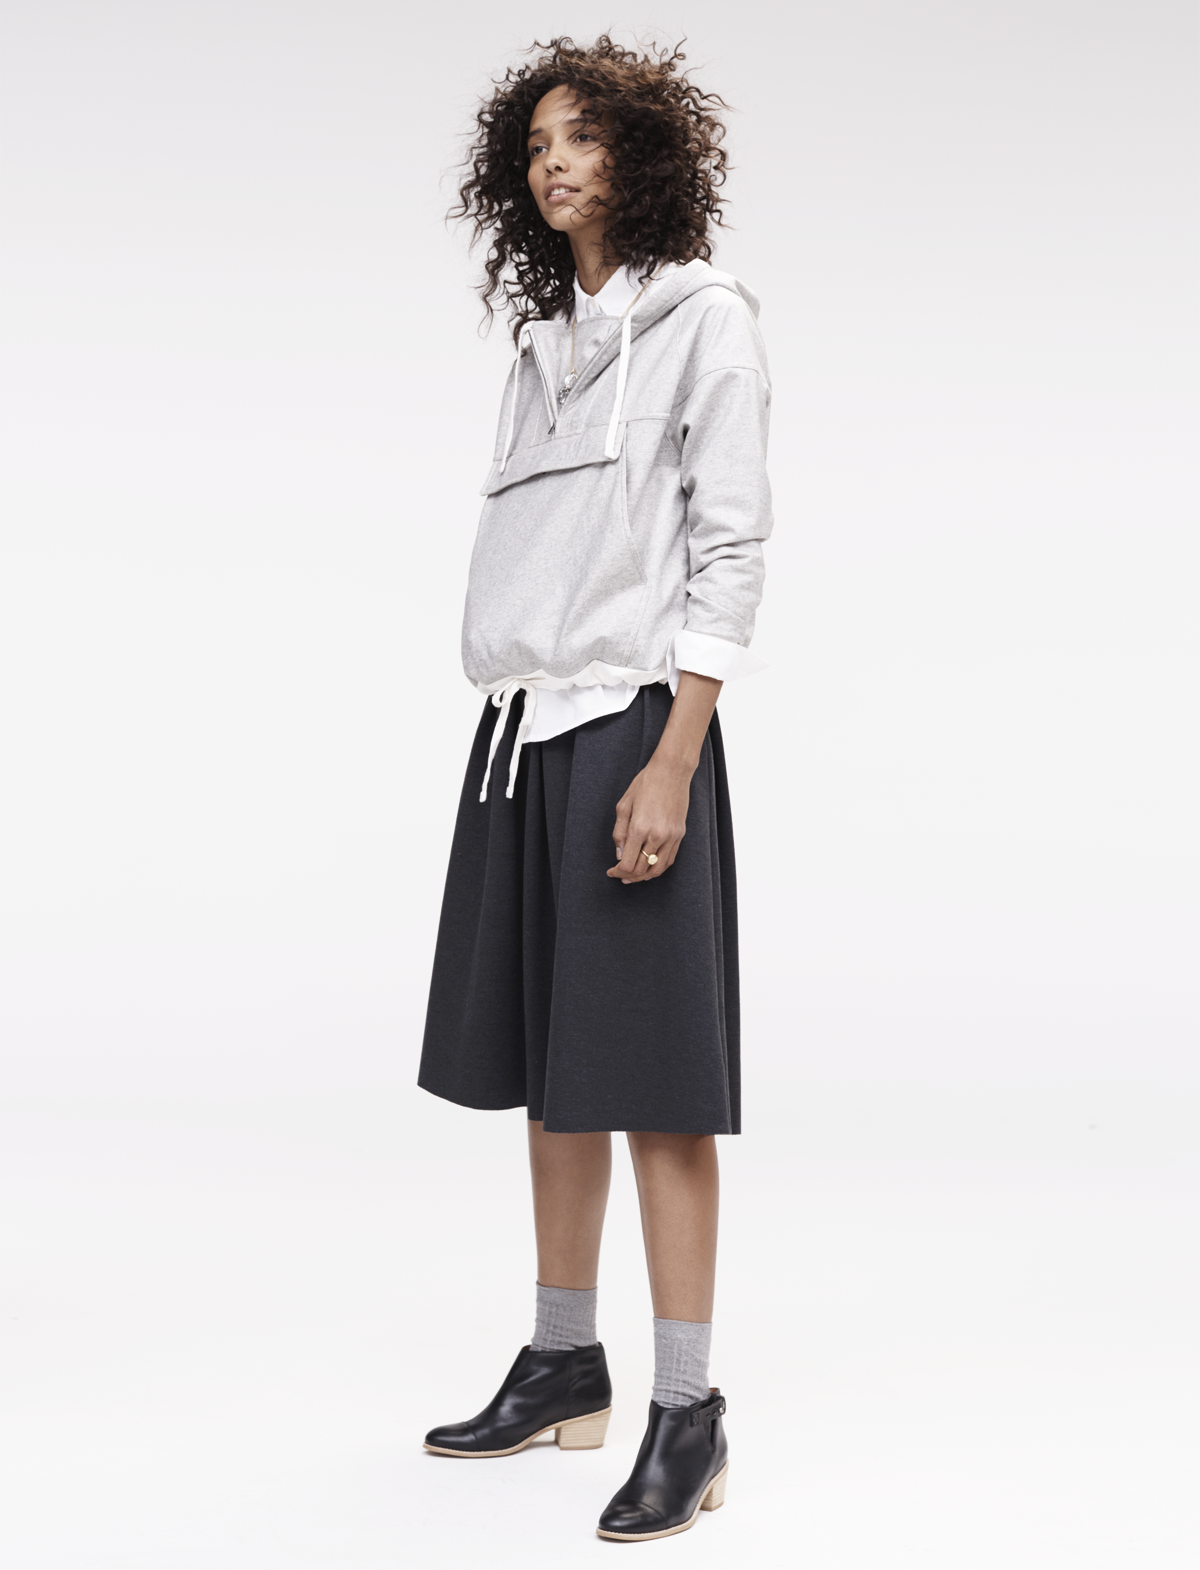 fd2ad9f01a Madewell pleated ponte midi skirt worn with the coated Windwake hoodie